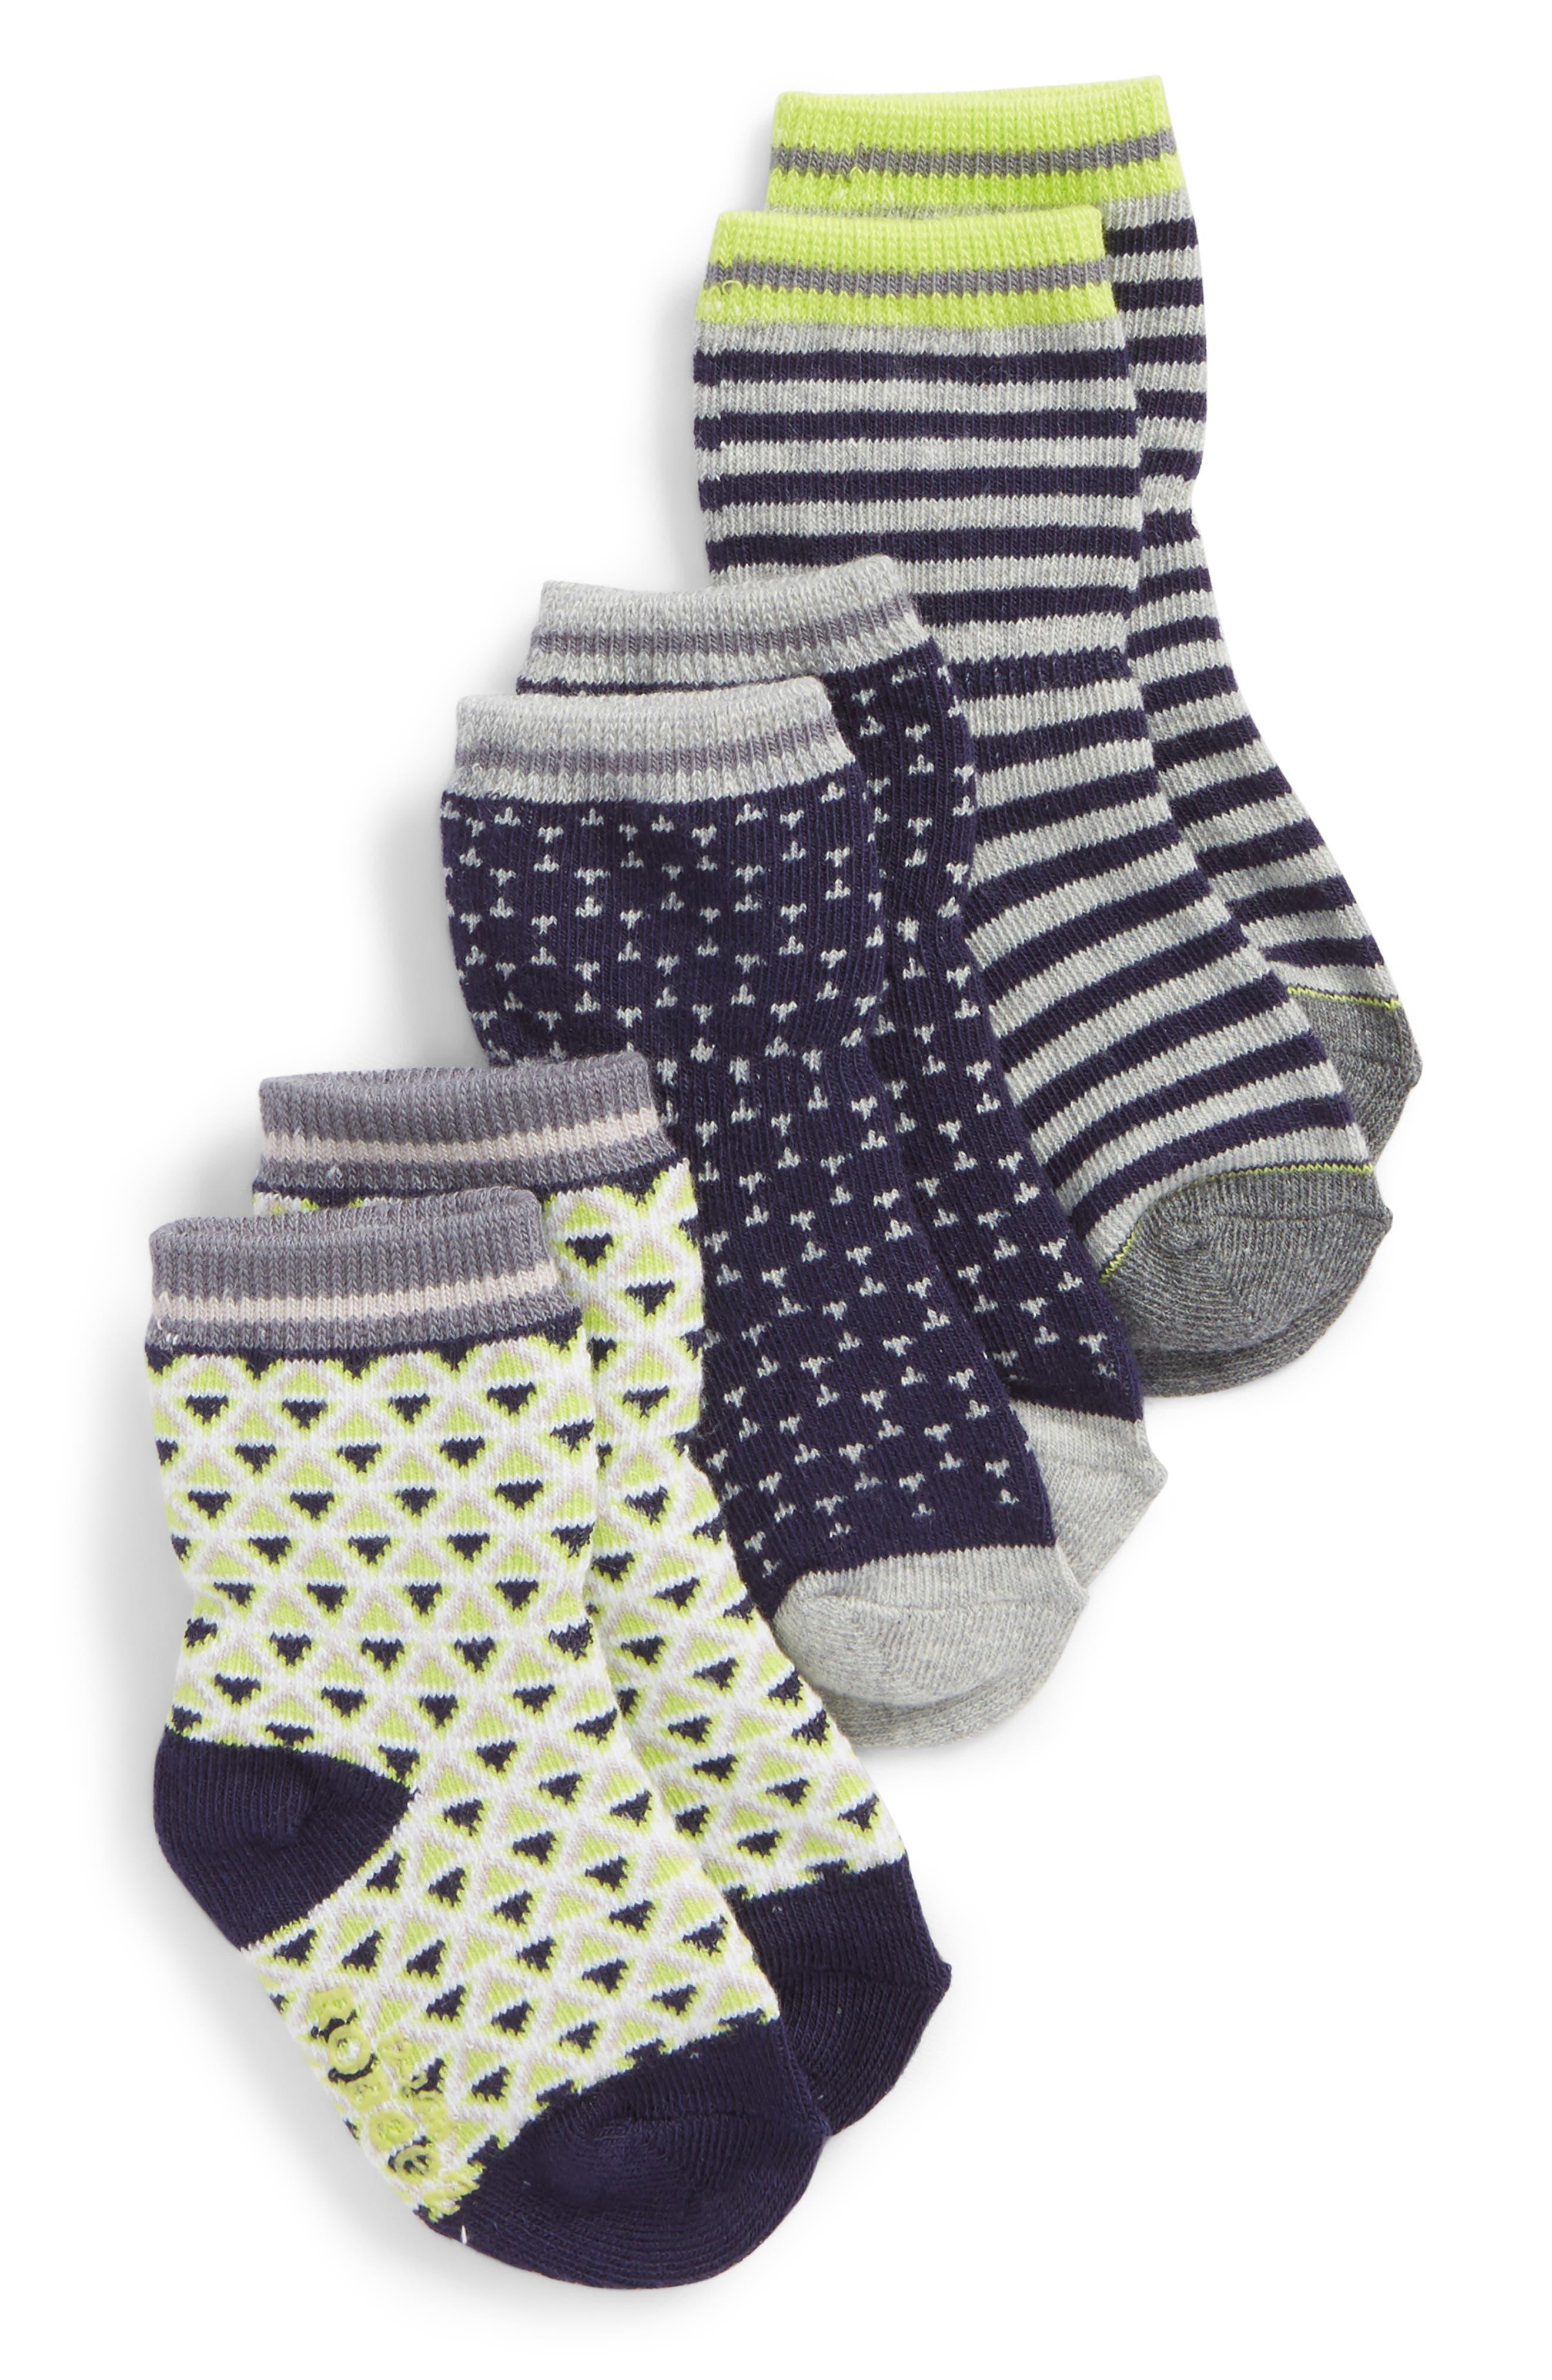 Geo 3-Pack Socks,                             Main thumbnail 1, color,                             Gray/ Navy/ Lime